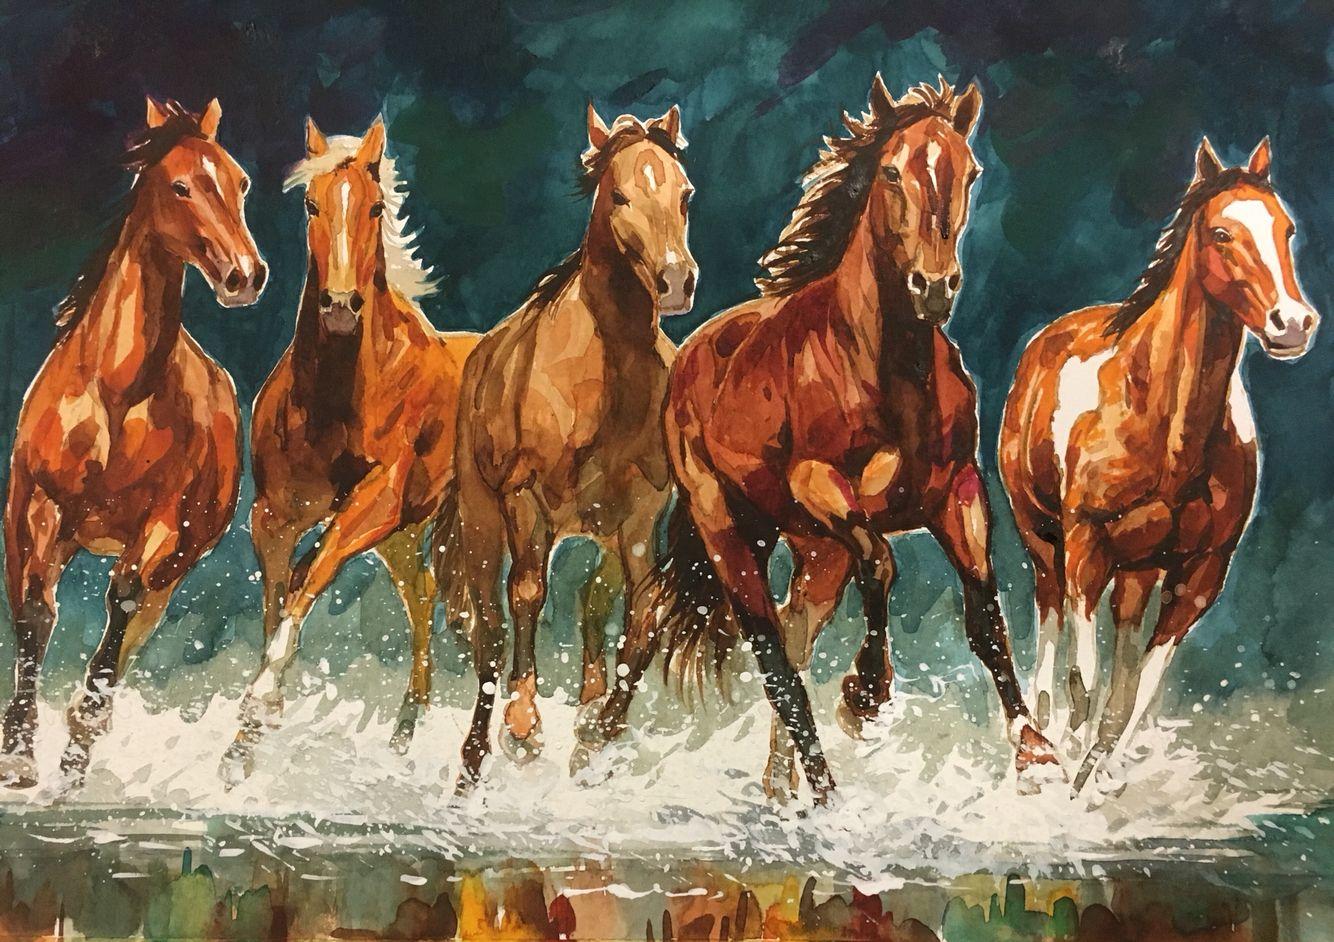 Horses Running Over Water Magical Horses Watercolor Horse Horses Running Painting